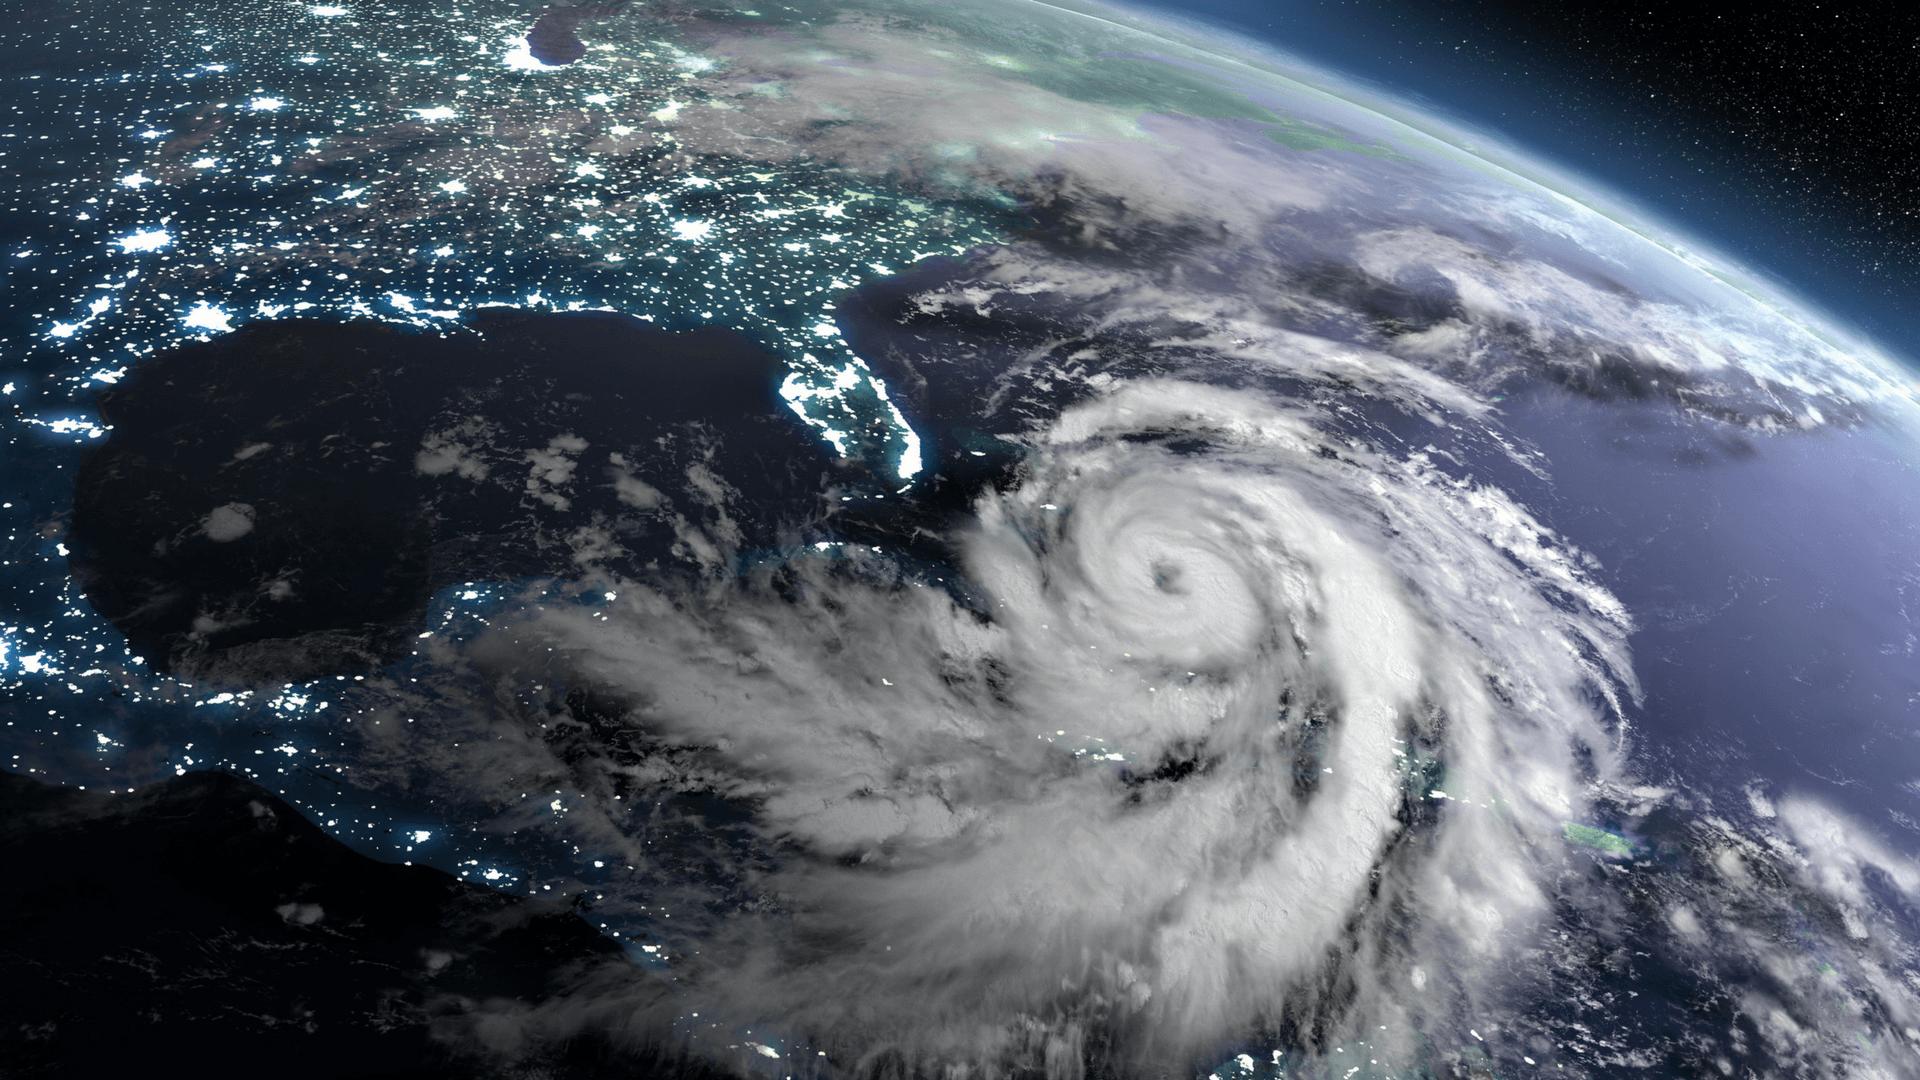 092217-Blog-Hurricane Emergency Preparedness and Citizen Communications (1)-1.png